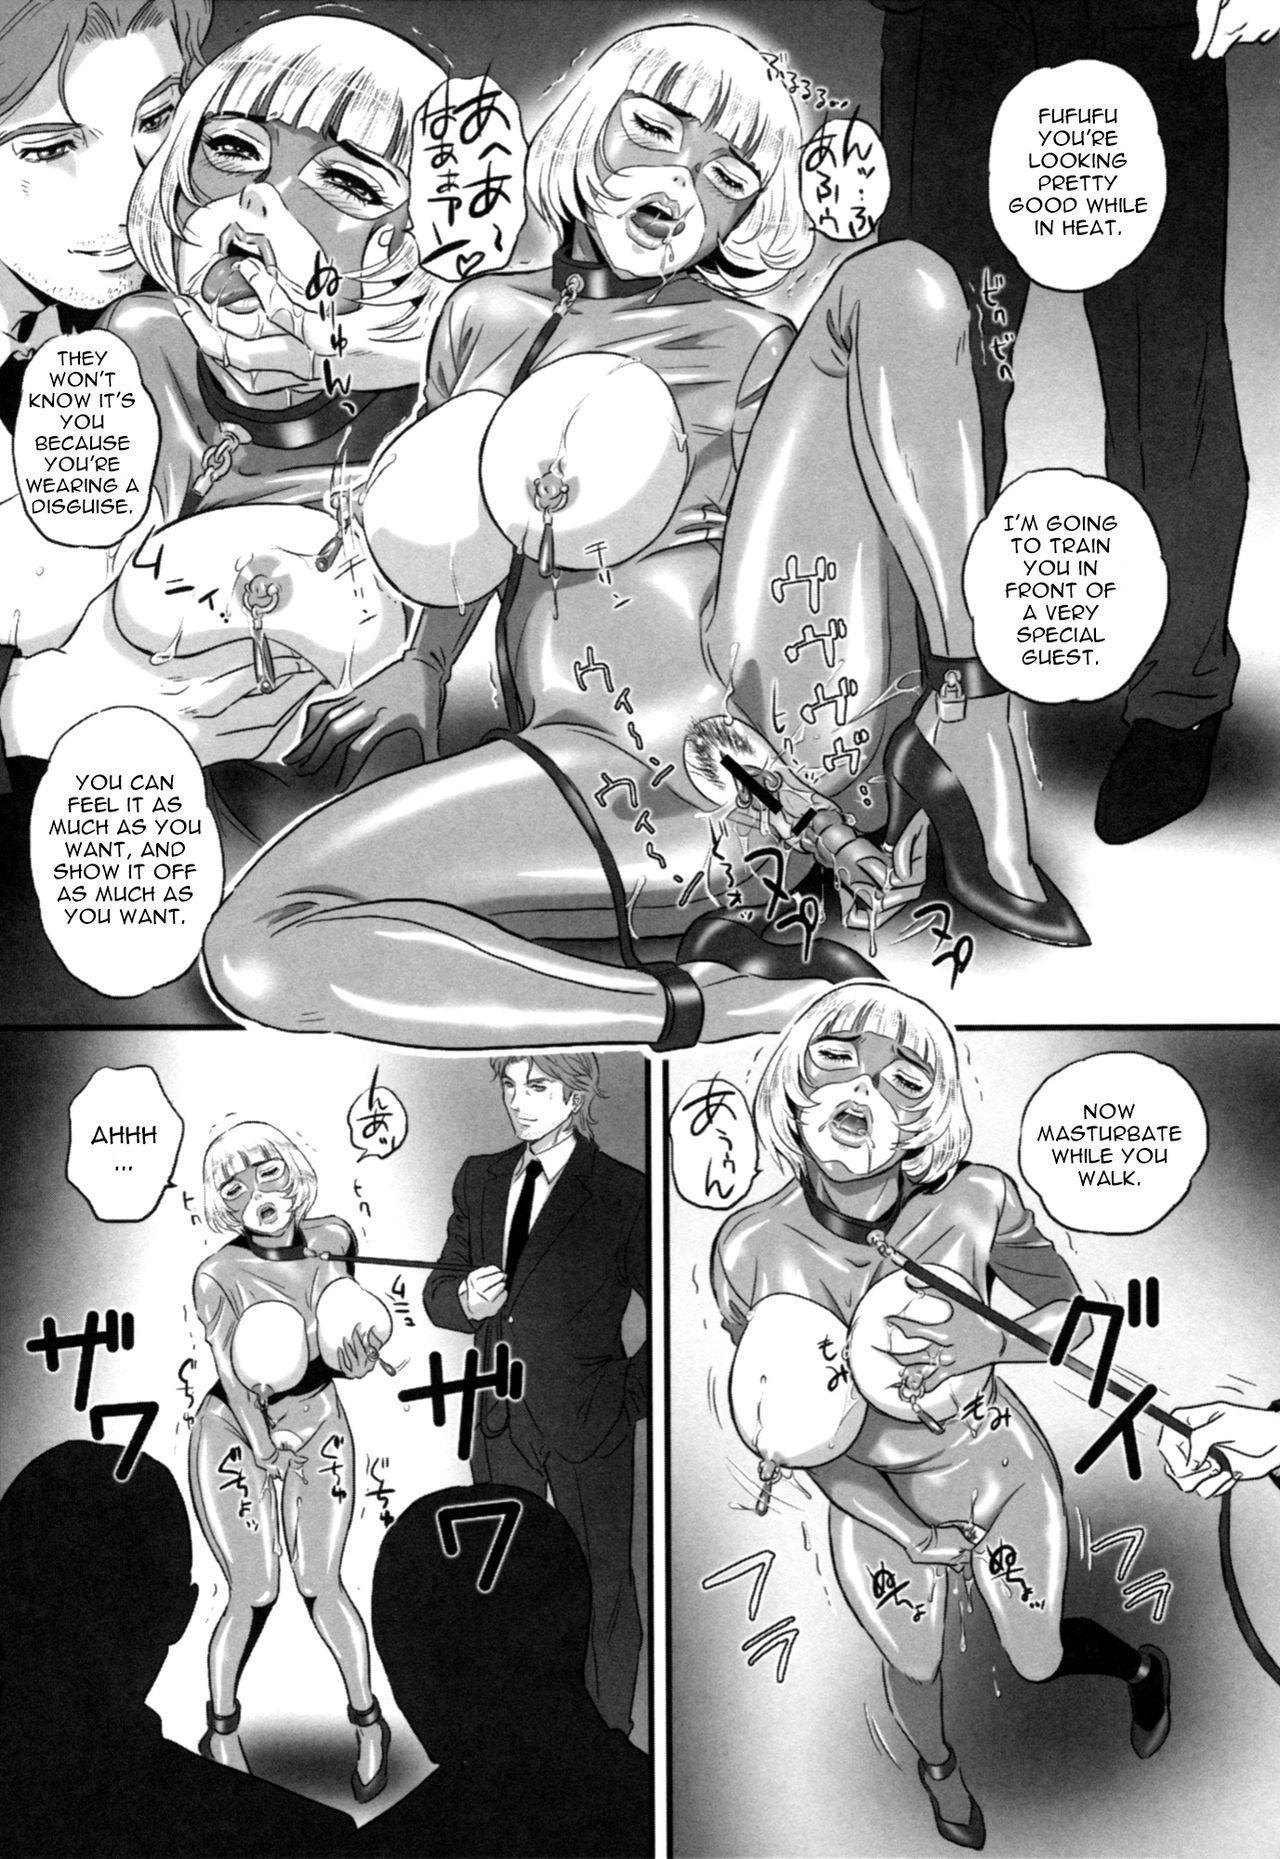 [MON-MON] Inmoraru ~aru hitodzuma no kaika~   Immoral ~Blossoming of a Married Woman~ (Ori no Naka no Ingi) [English] 12